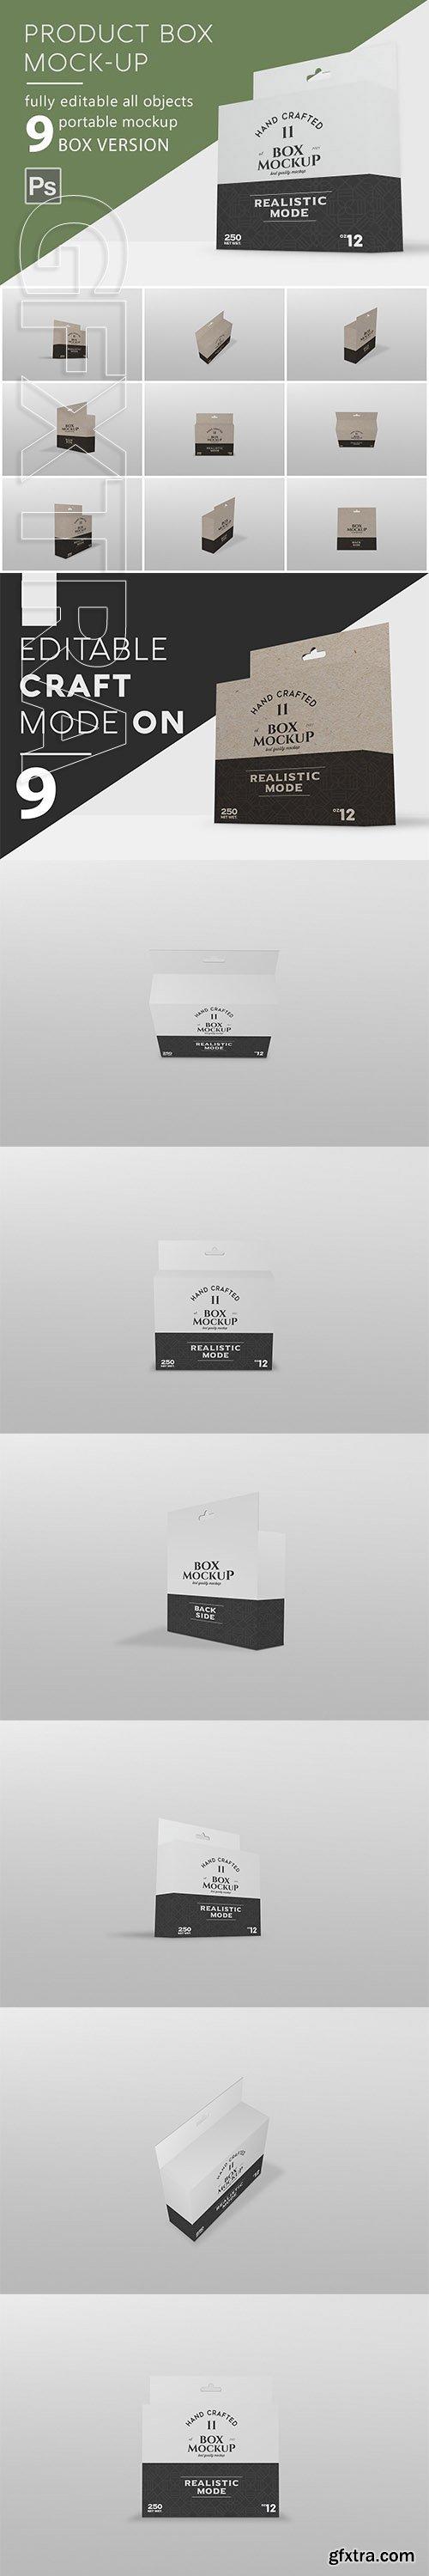 CreativeMarket - Branding Box Mockup 2944354